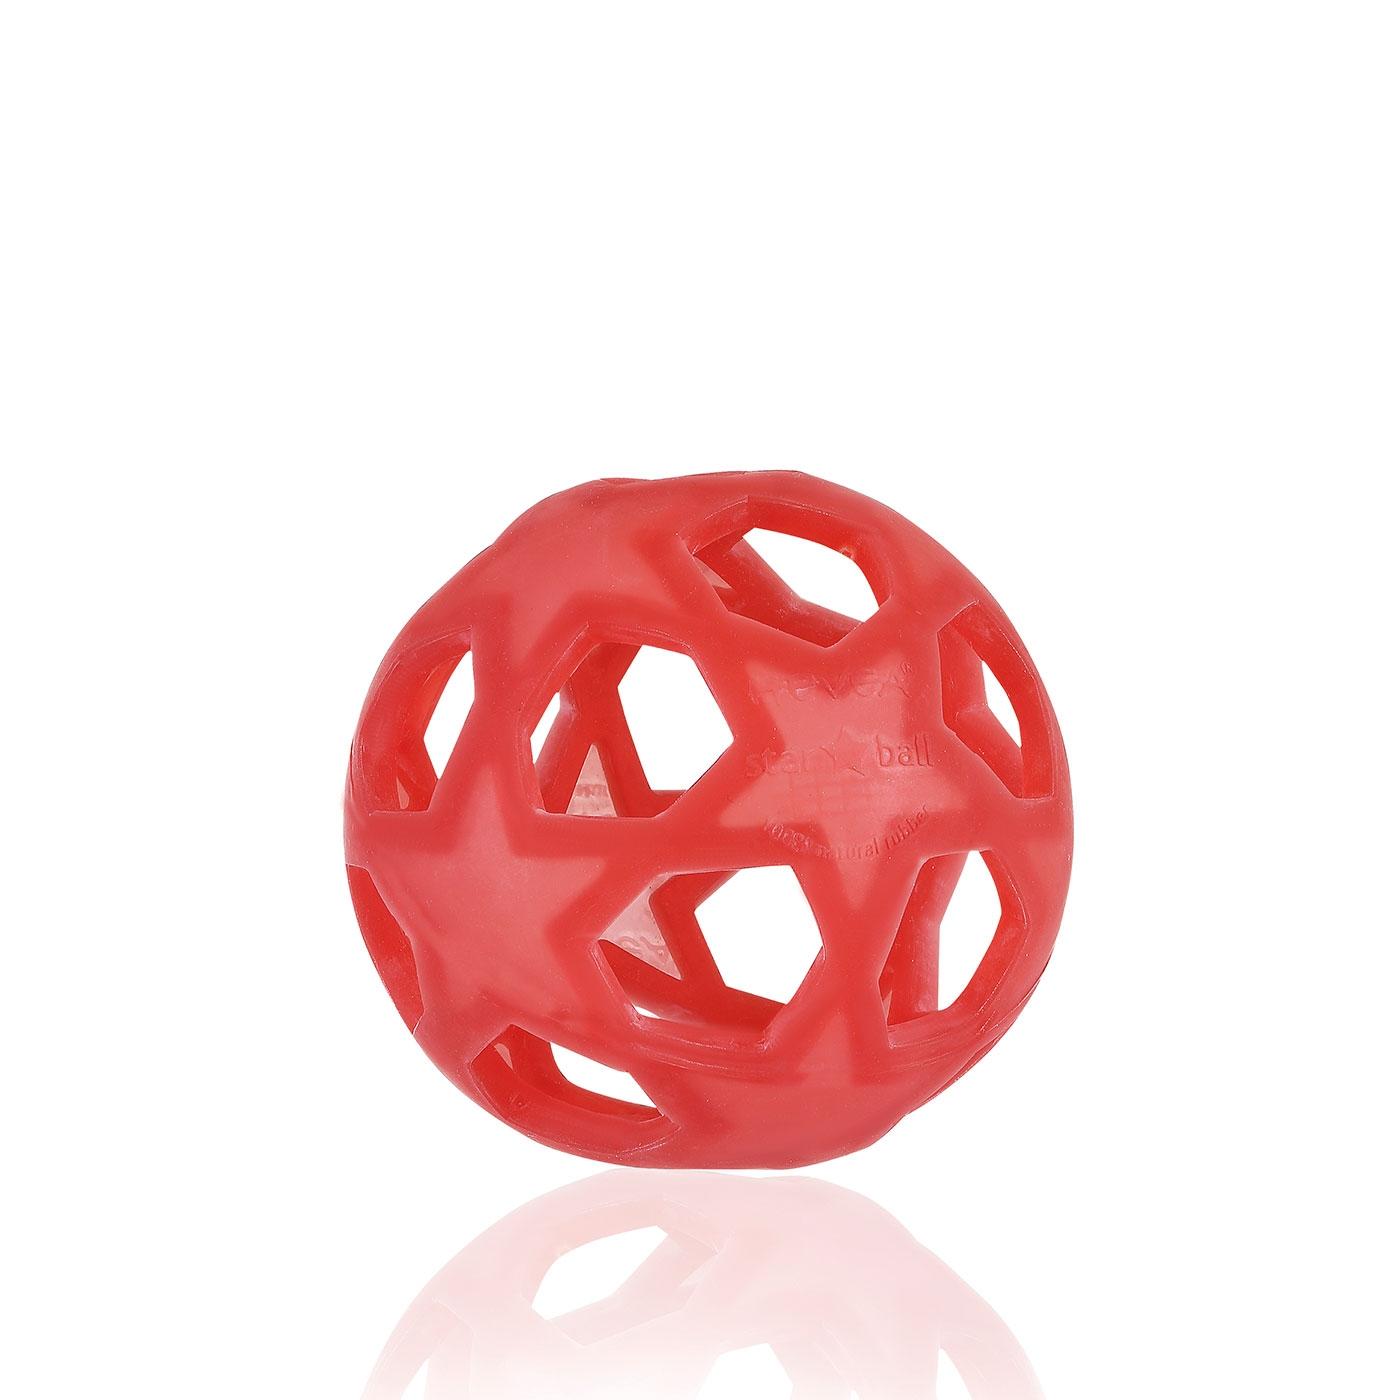 Hevea Star Ball Babyleksak - Raspberry